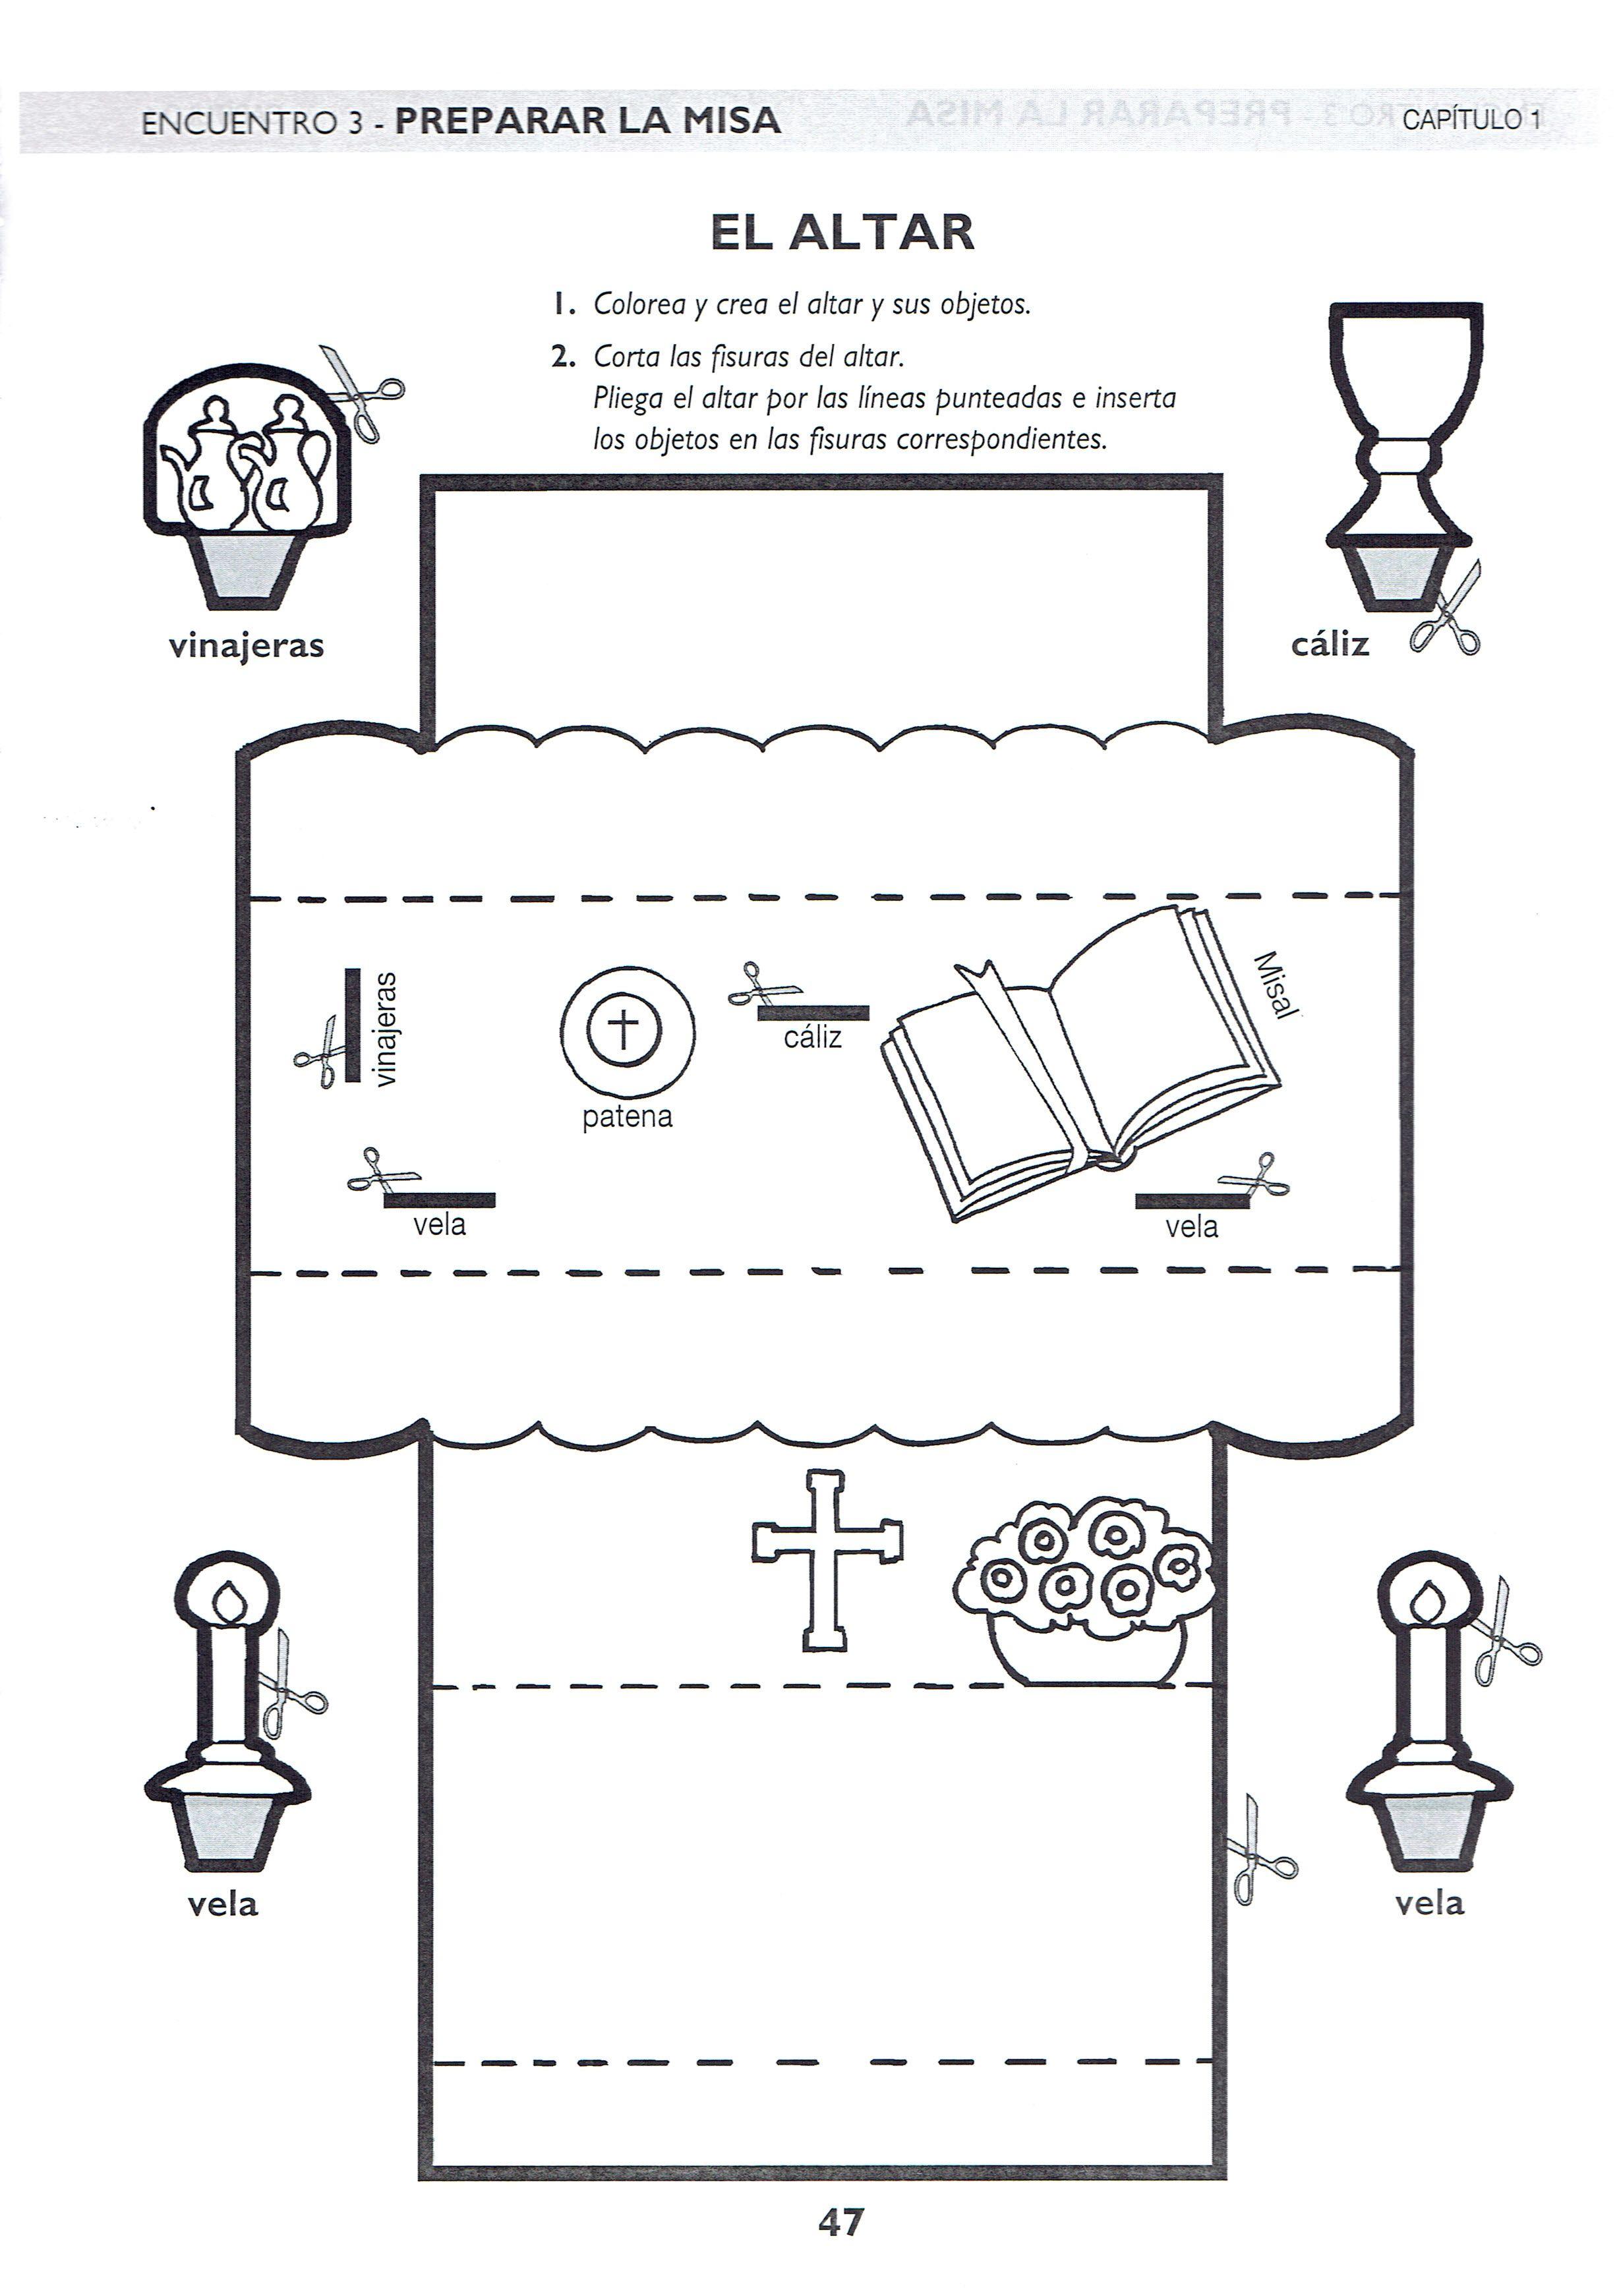 Descubrir La Misa El Altar Catequesis Educacion Religiosa Temas De Catequesis